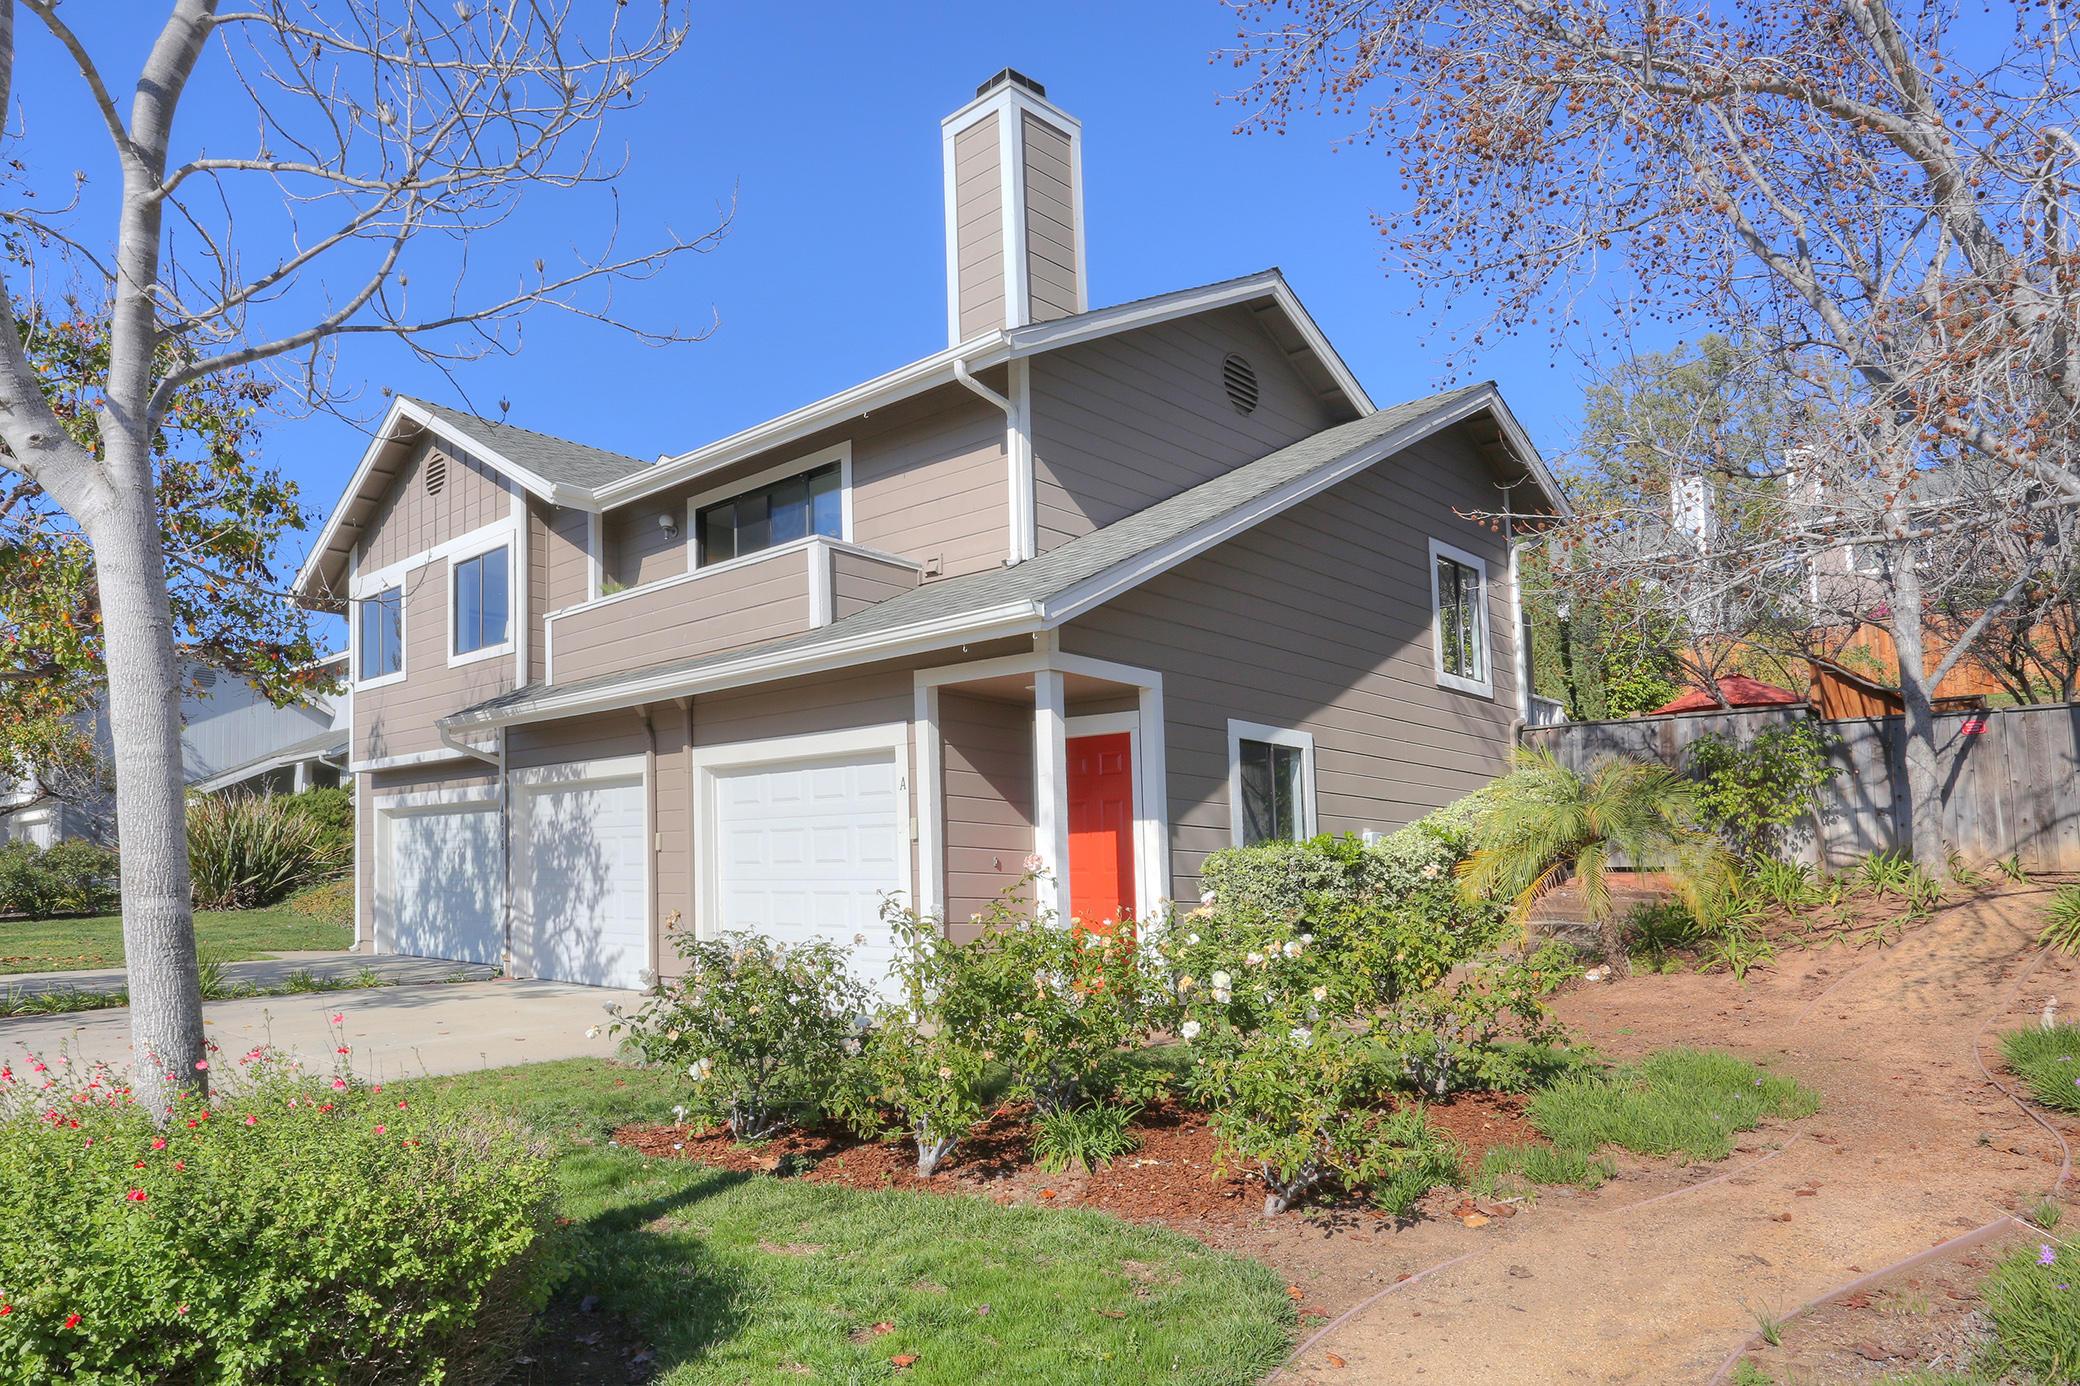 Property photo for 4018 Primavera Rd #A Santa Barbara, California 93110 - 17-199